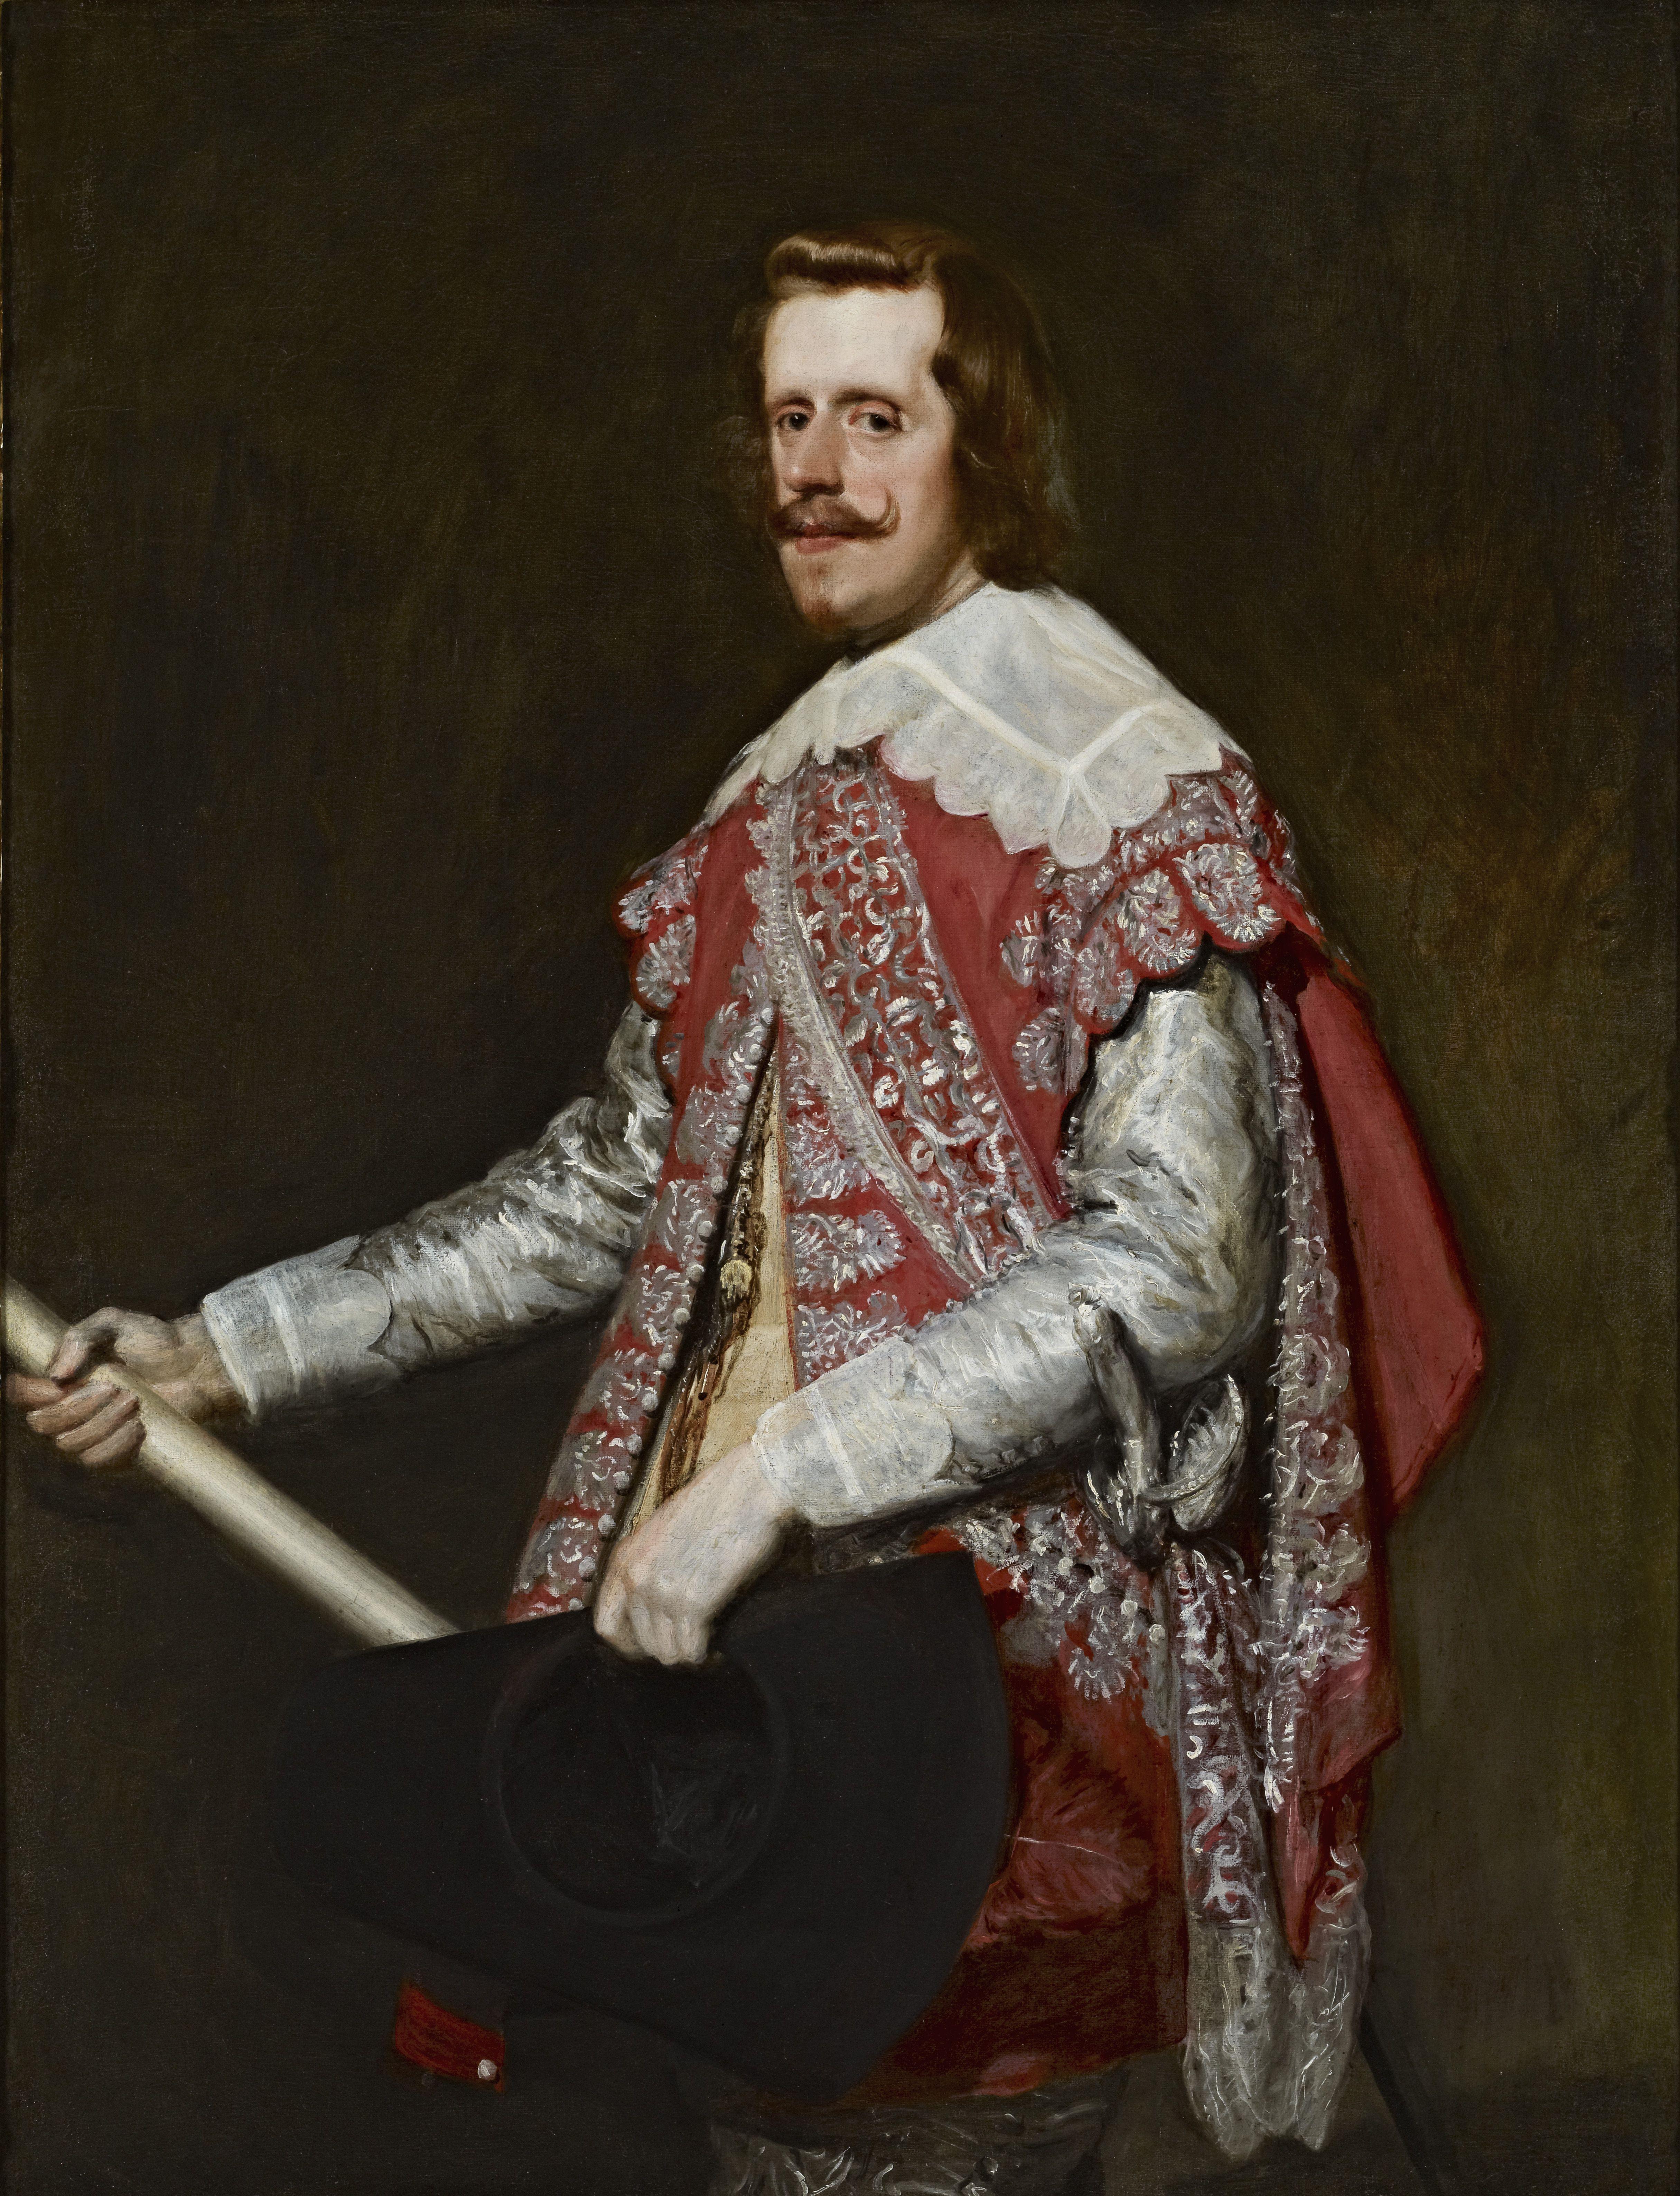 foto de Philip IV of Spain - Wikipedia